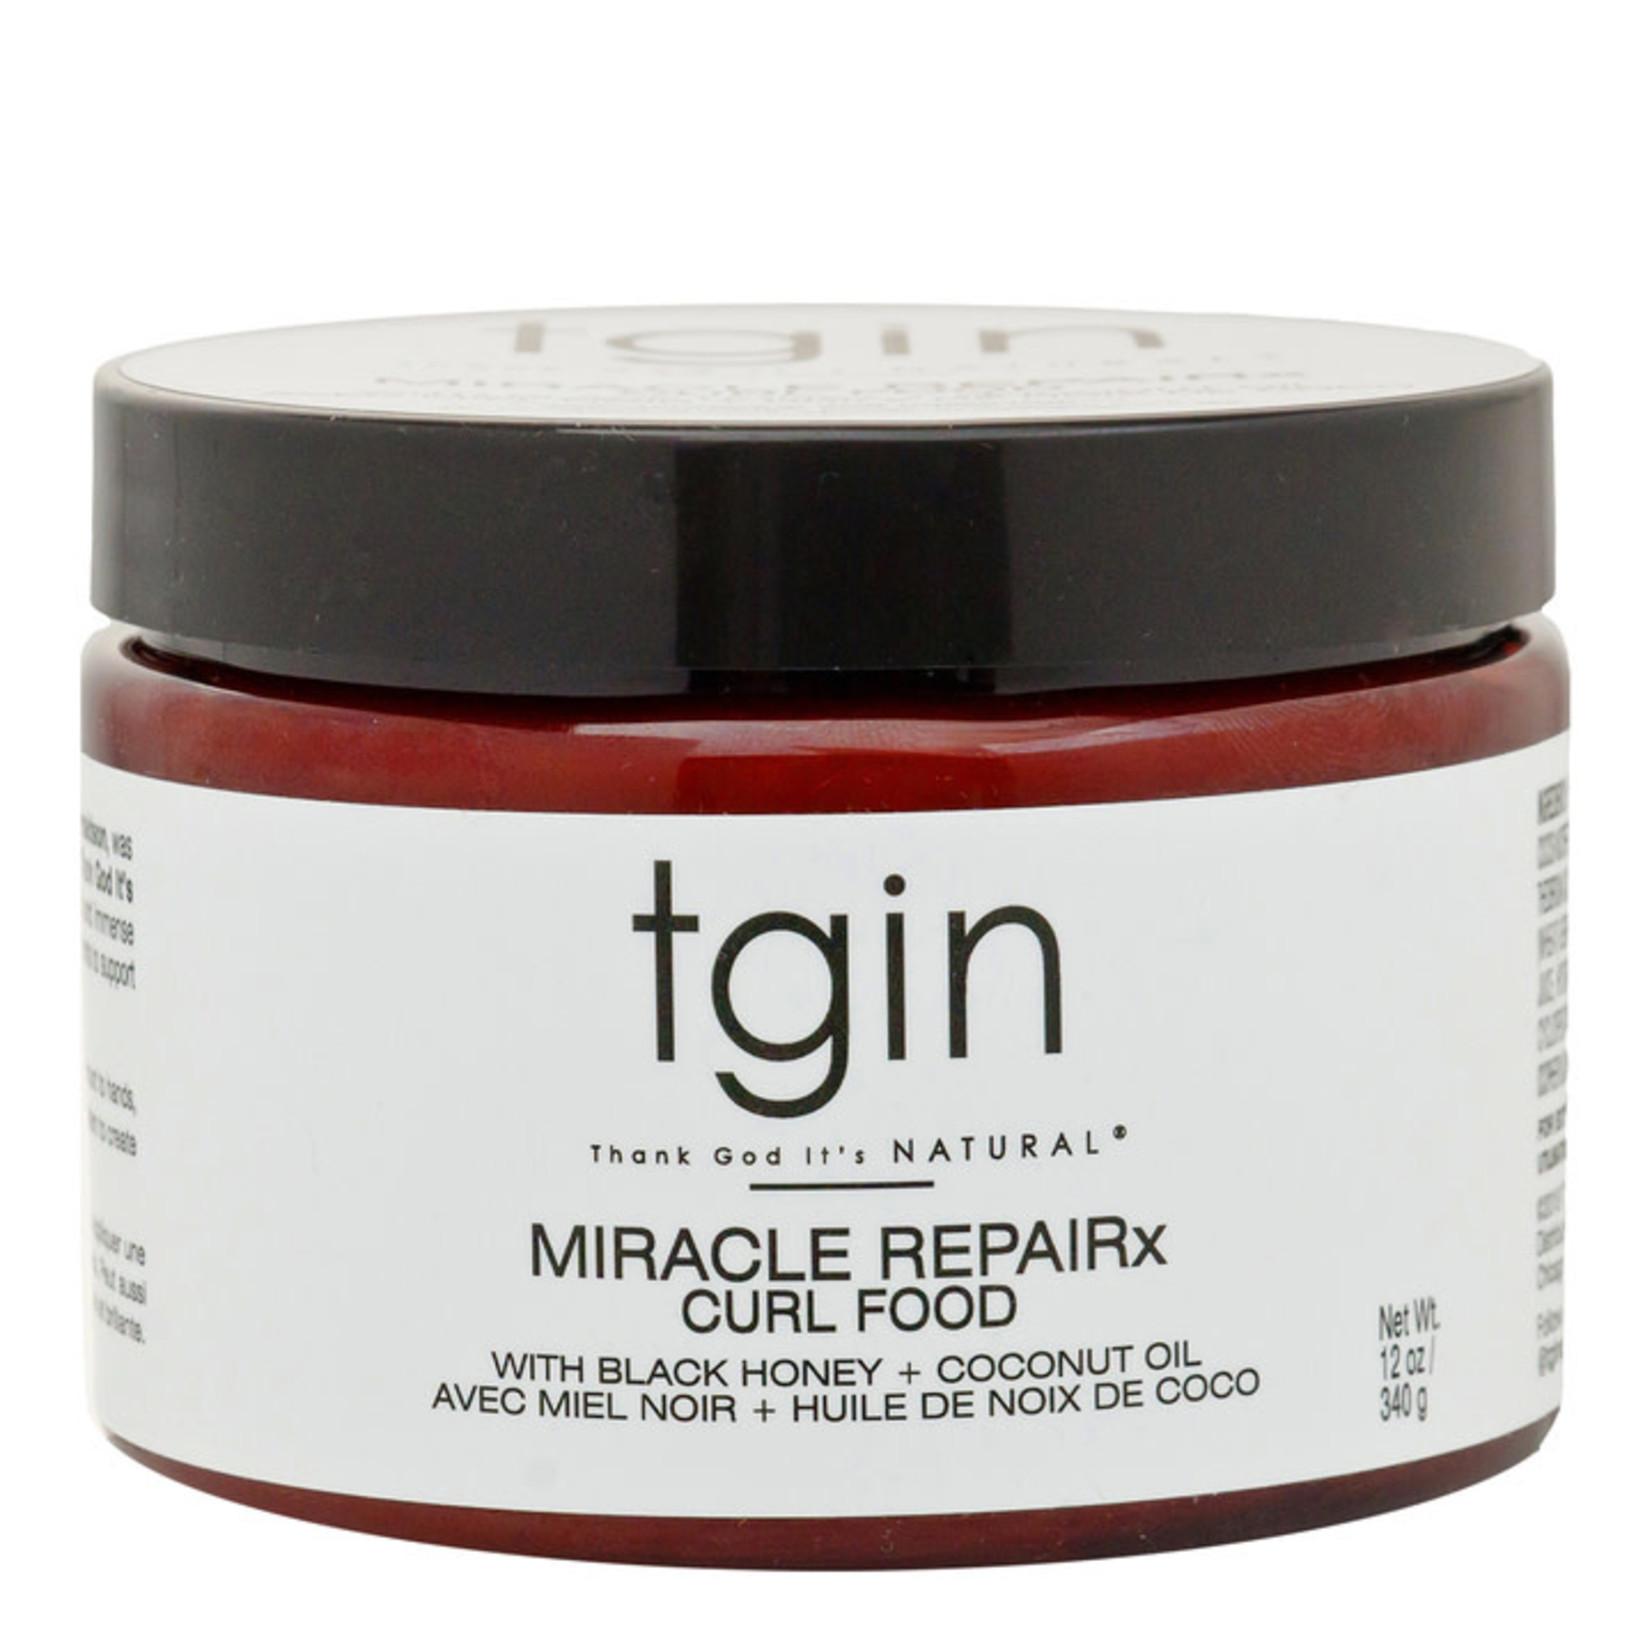 TGIN TGIN MIRACLE REPAIRX CURL FOOD DAILY MOISTURIZER [12OZ]